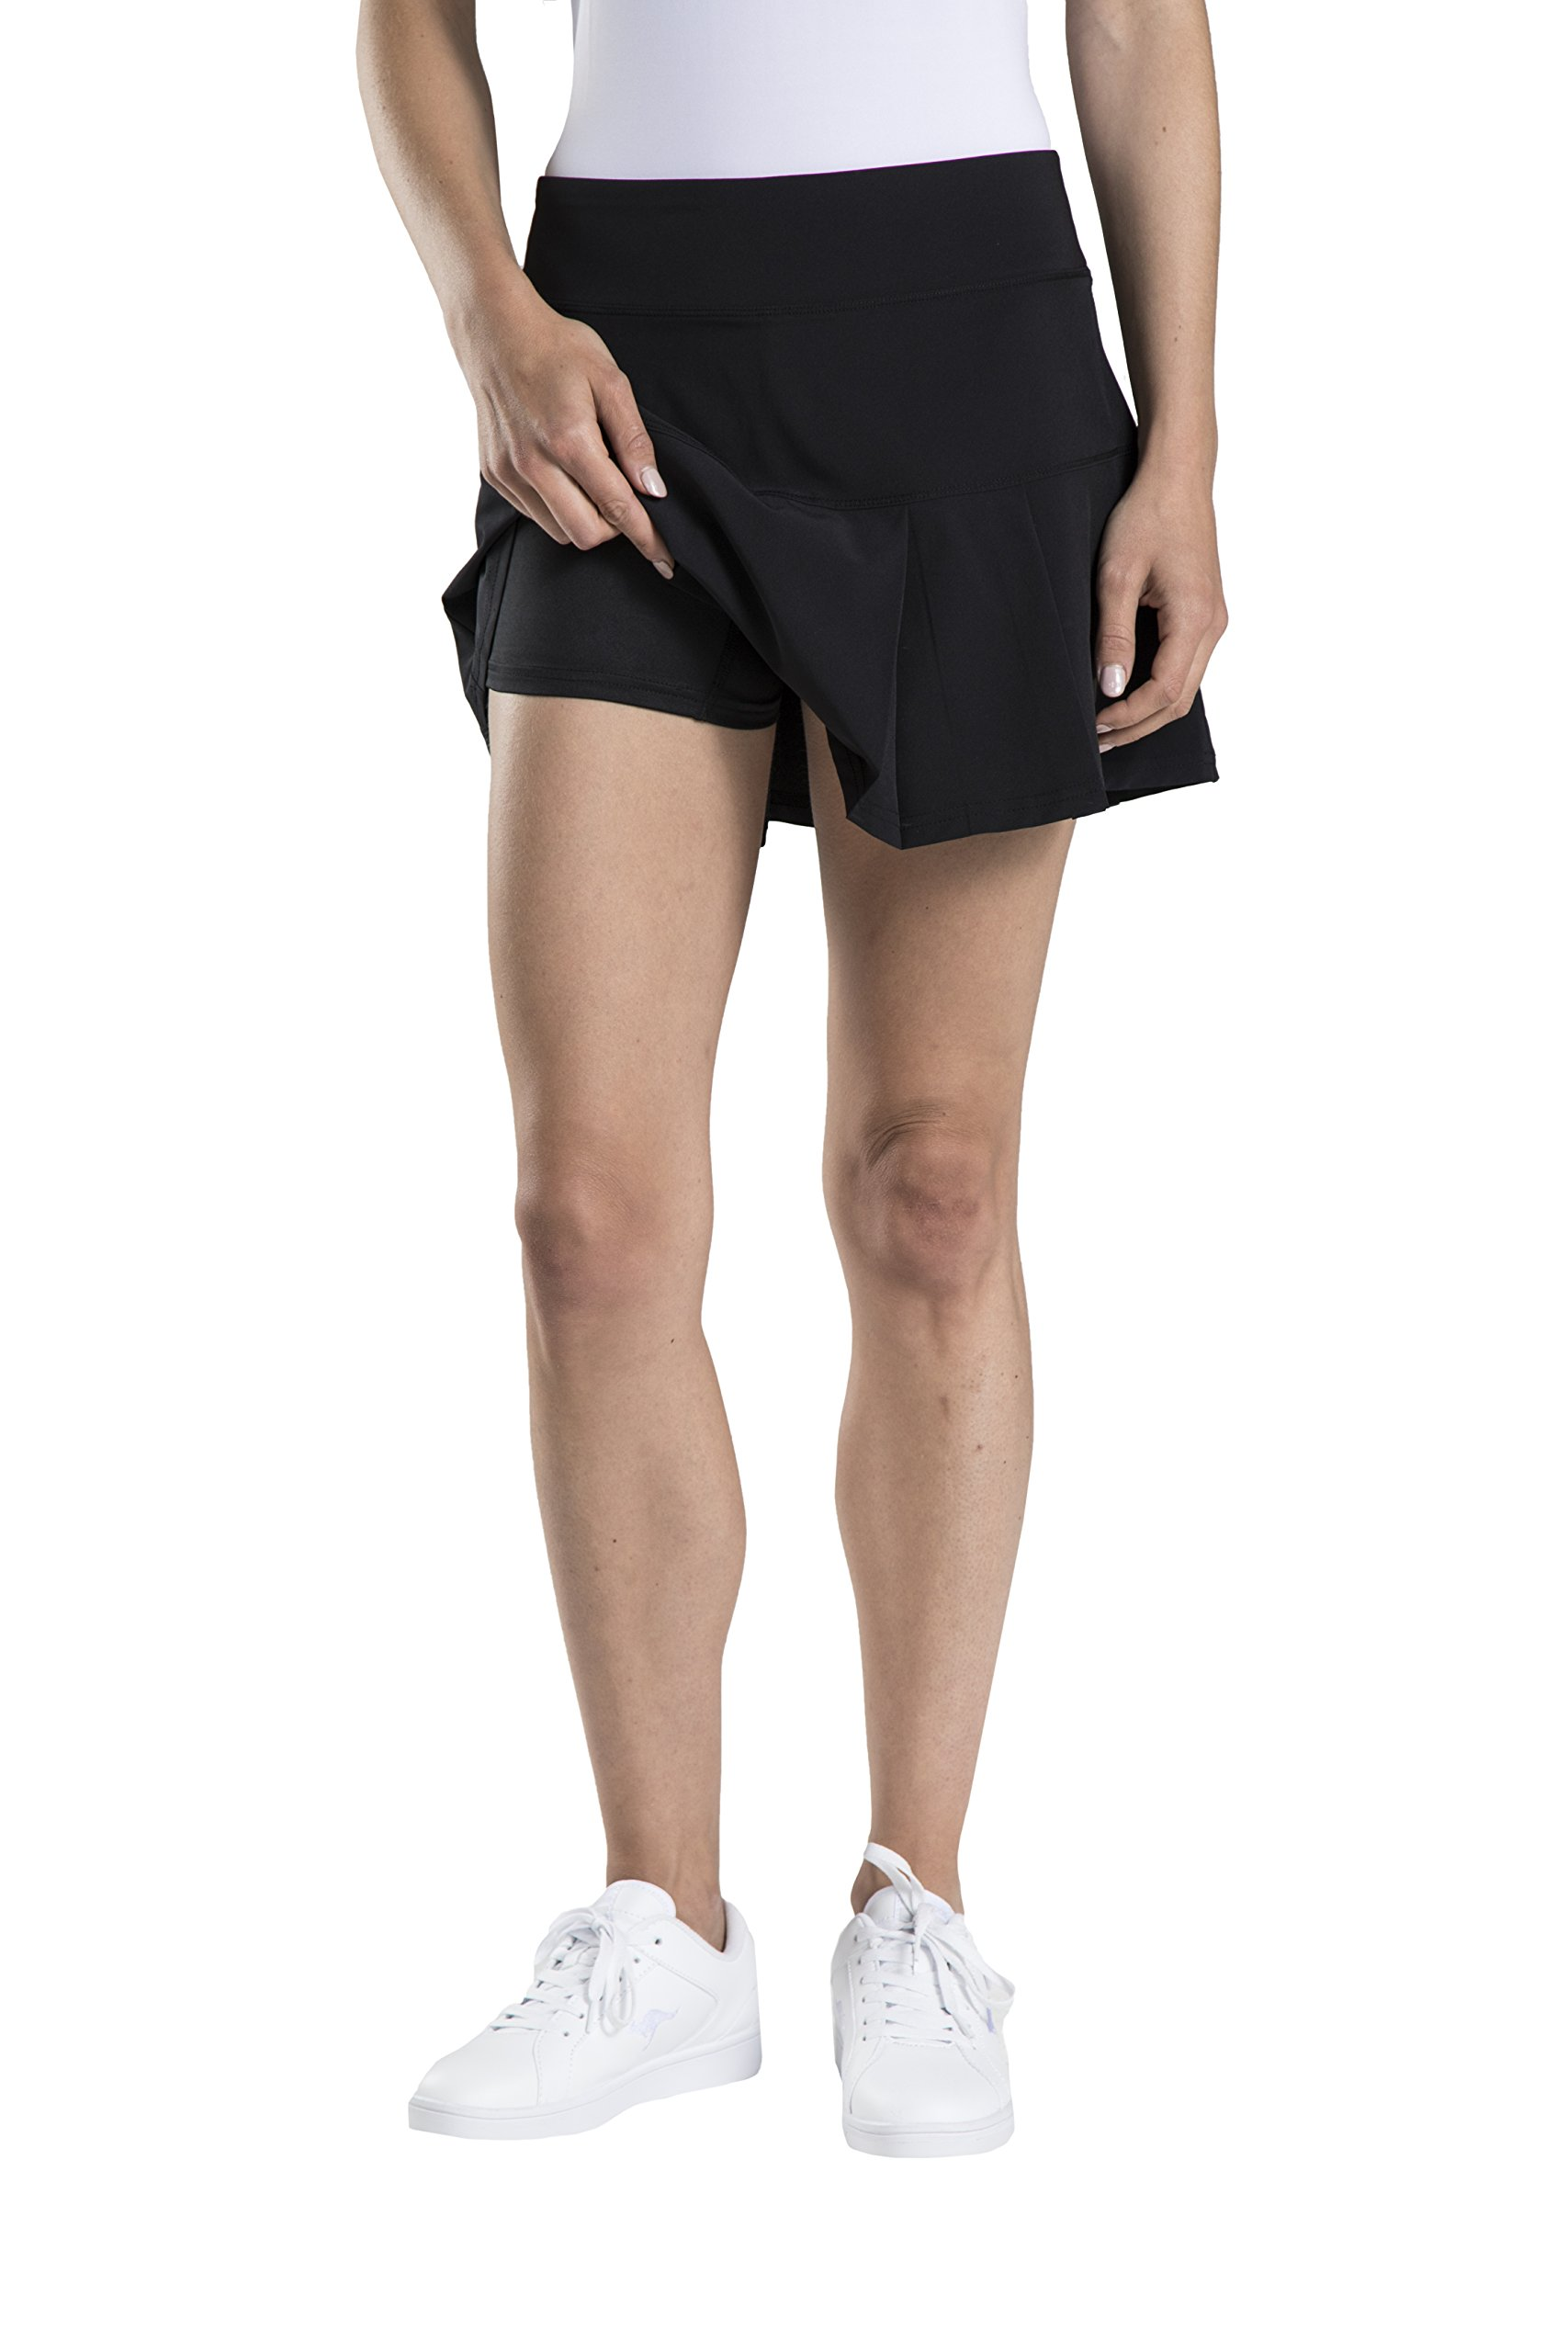 Etonic Women's Stretch Woven Tennis Skort, Black, Large